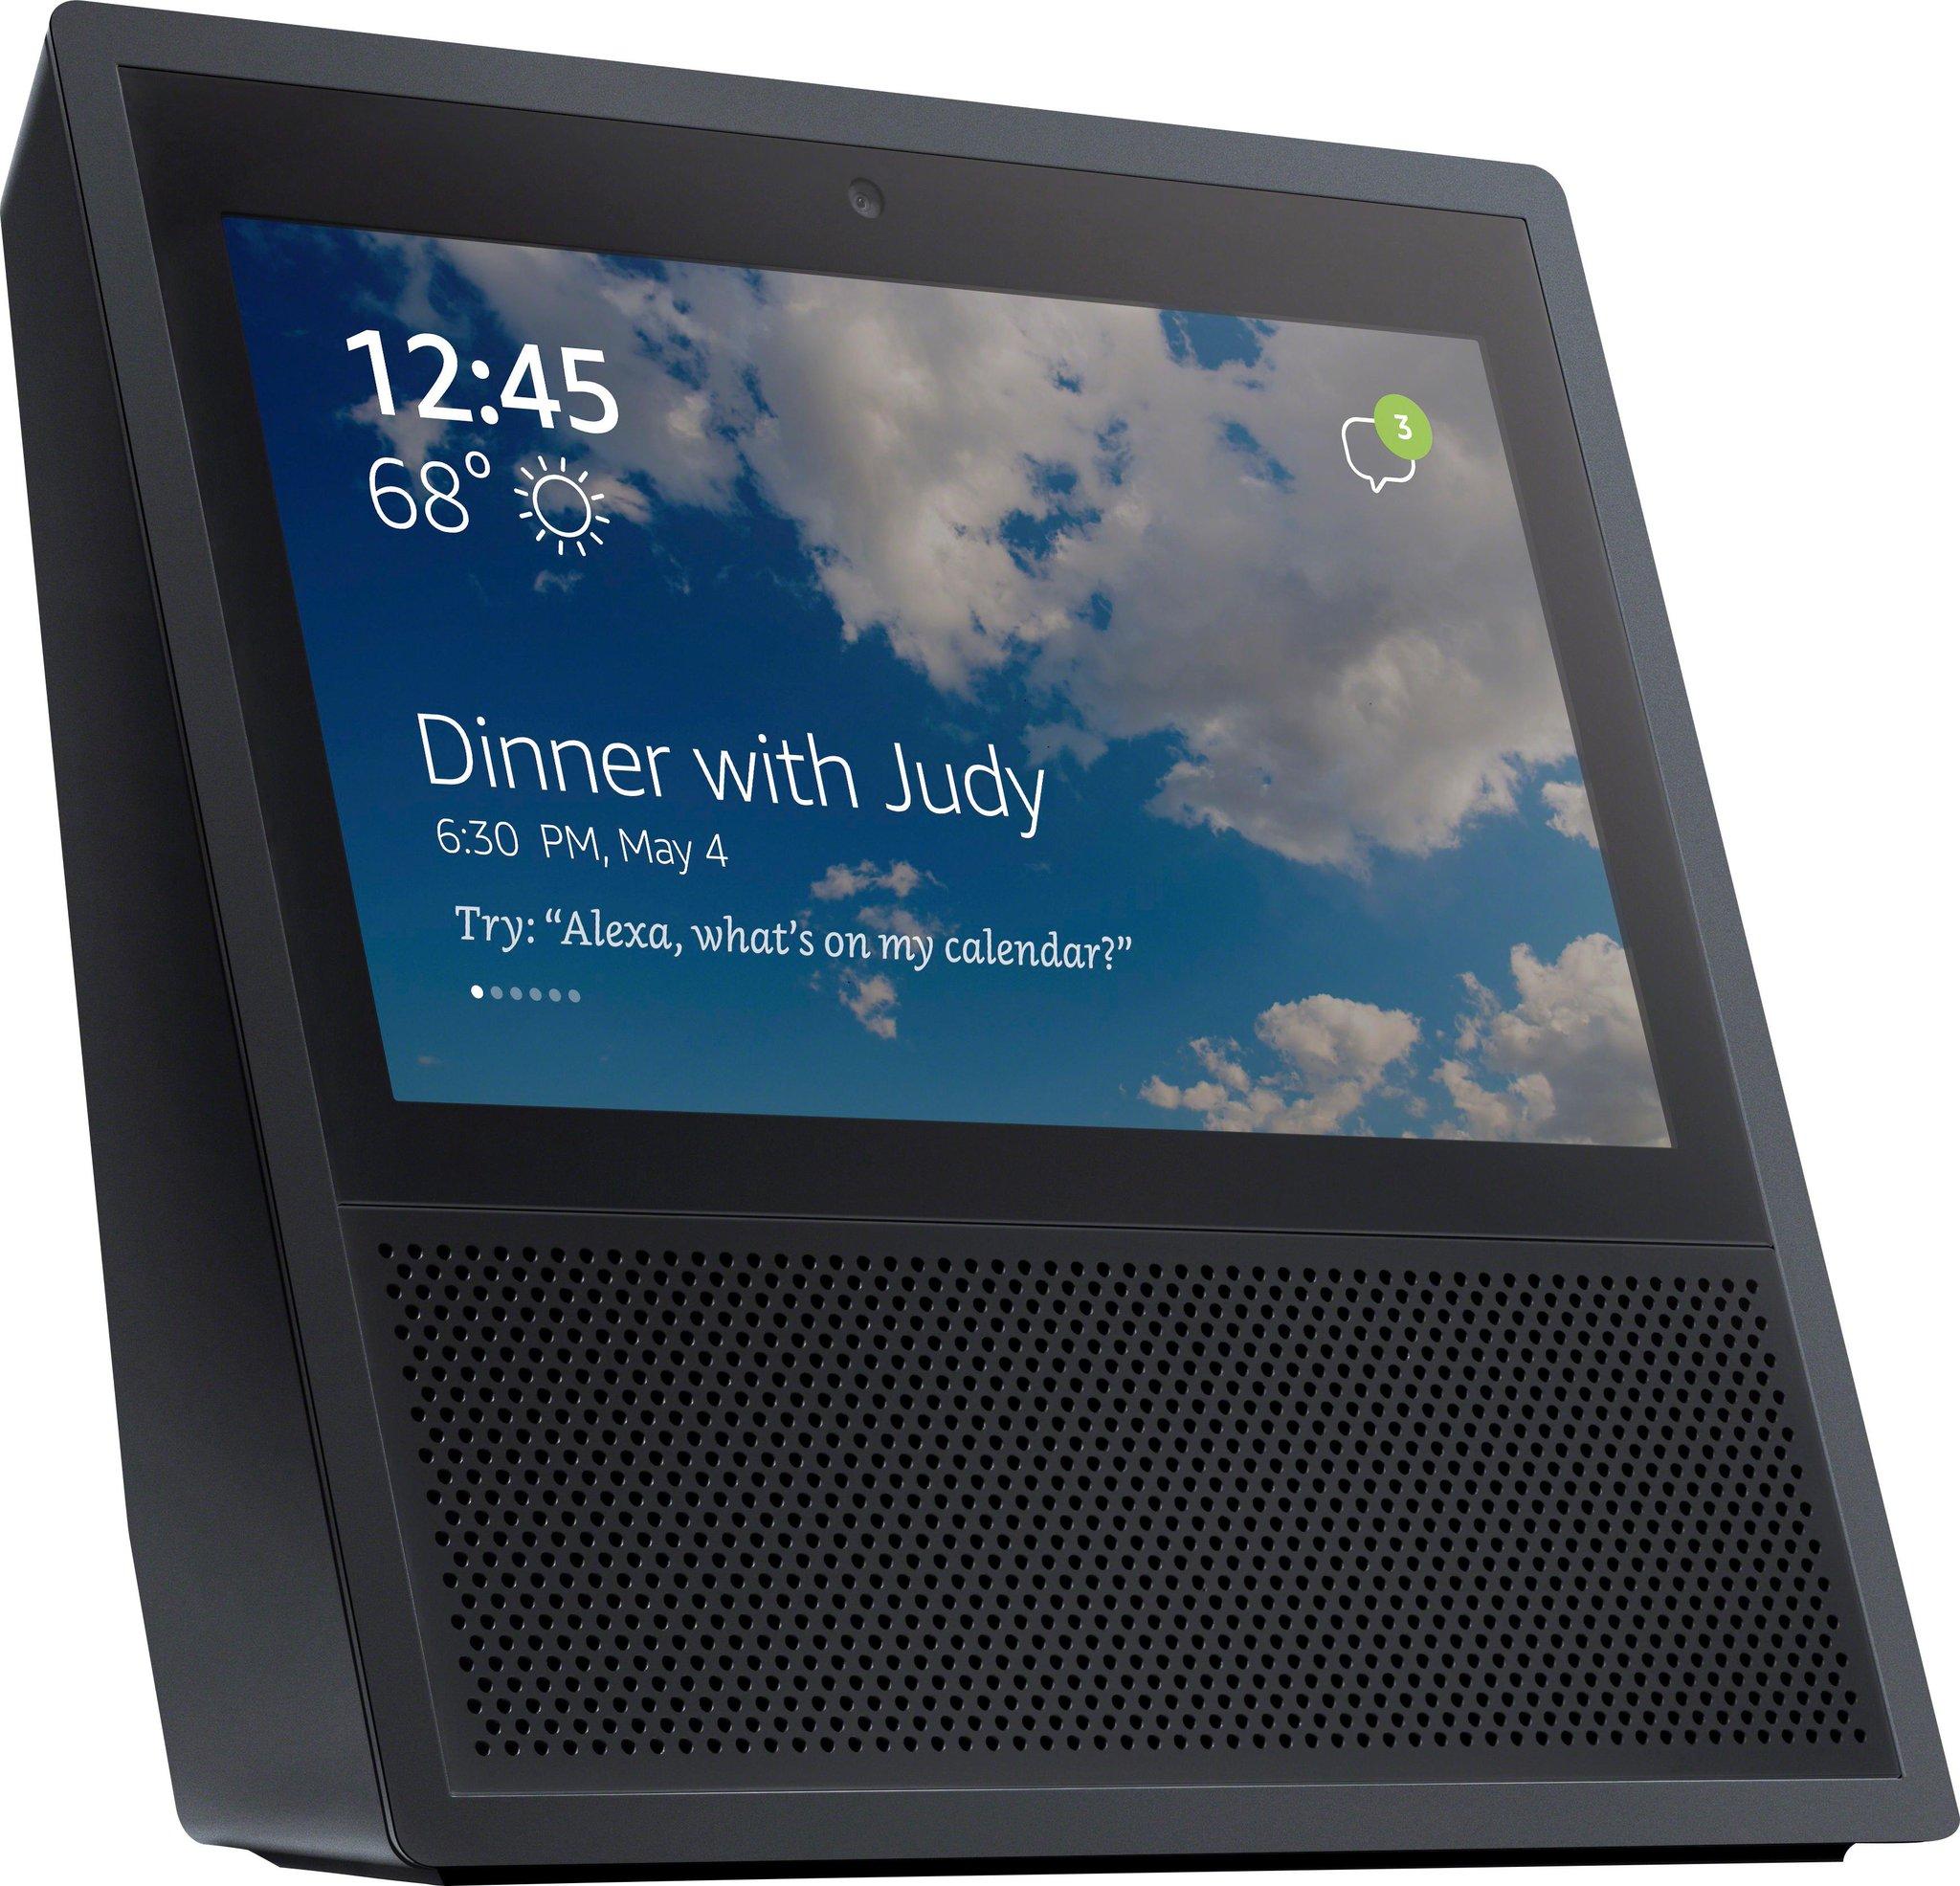 Amazon stellt neuen